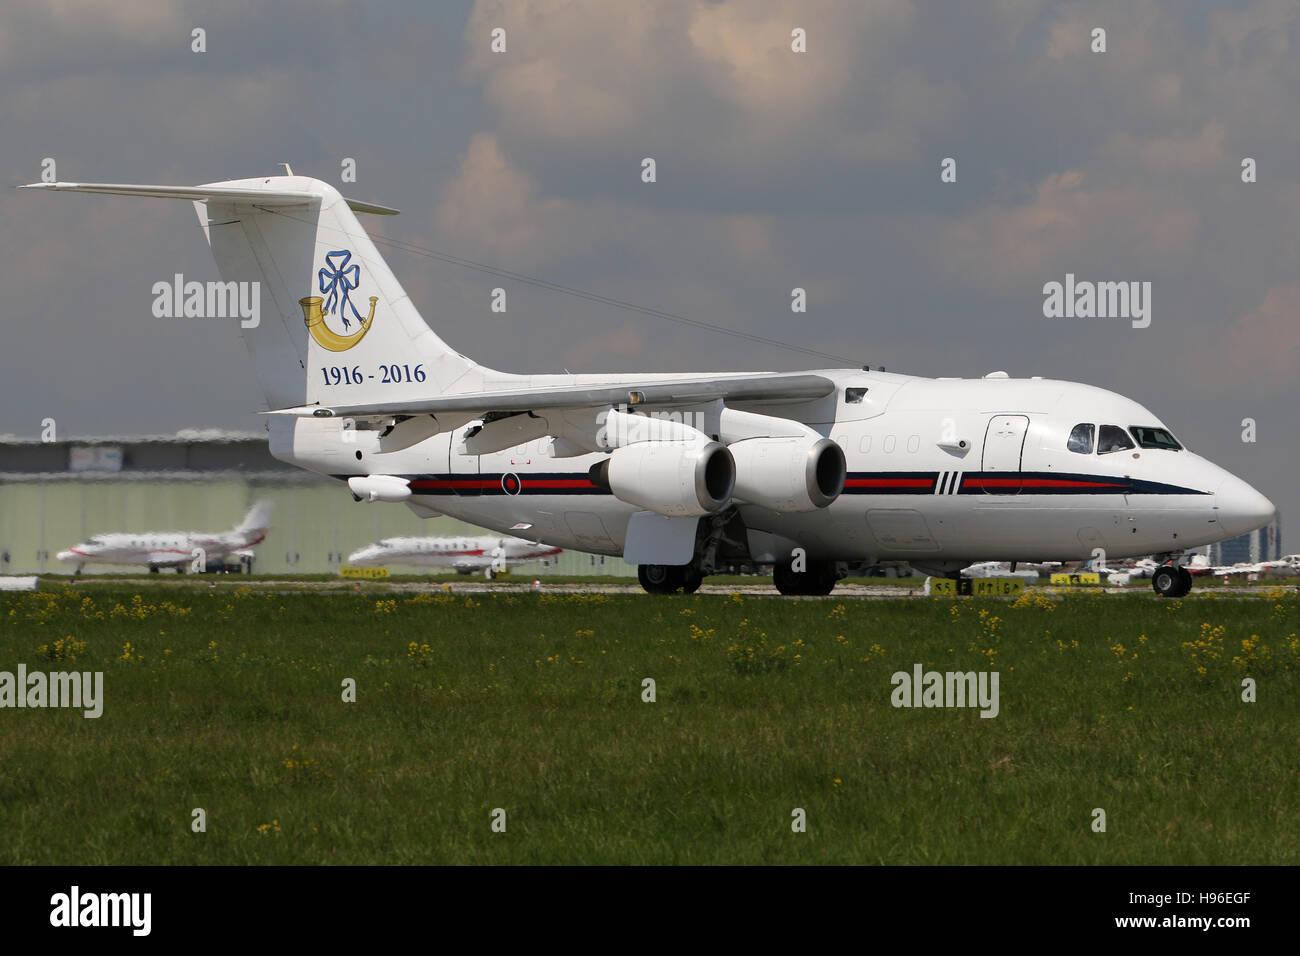 Stuttgart, Germany – May 04, 2016: English Government BAE Avro at Stuttgart Airport Stock Photo